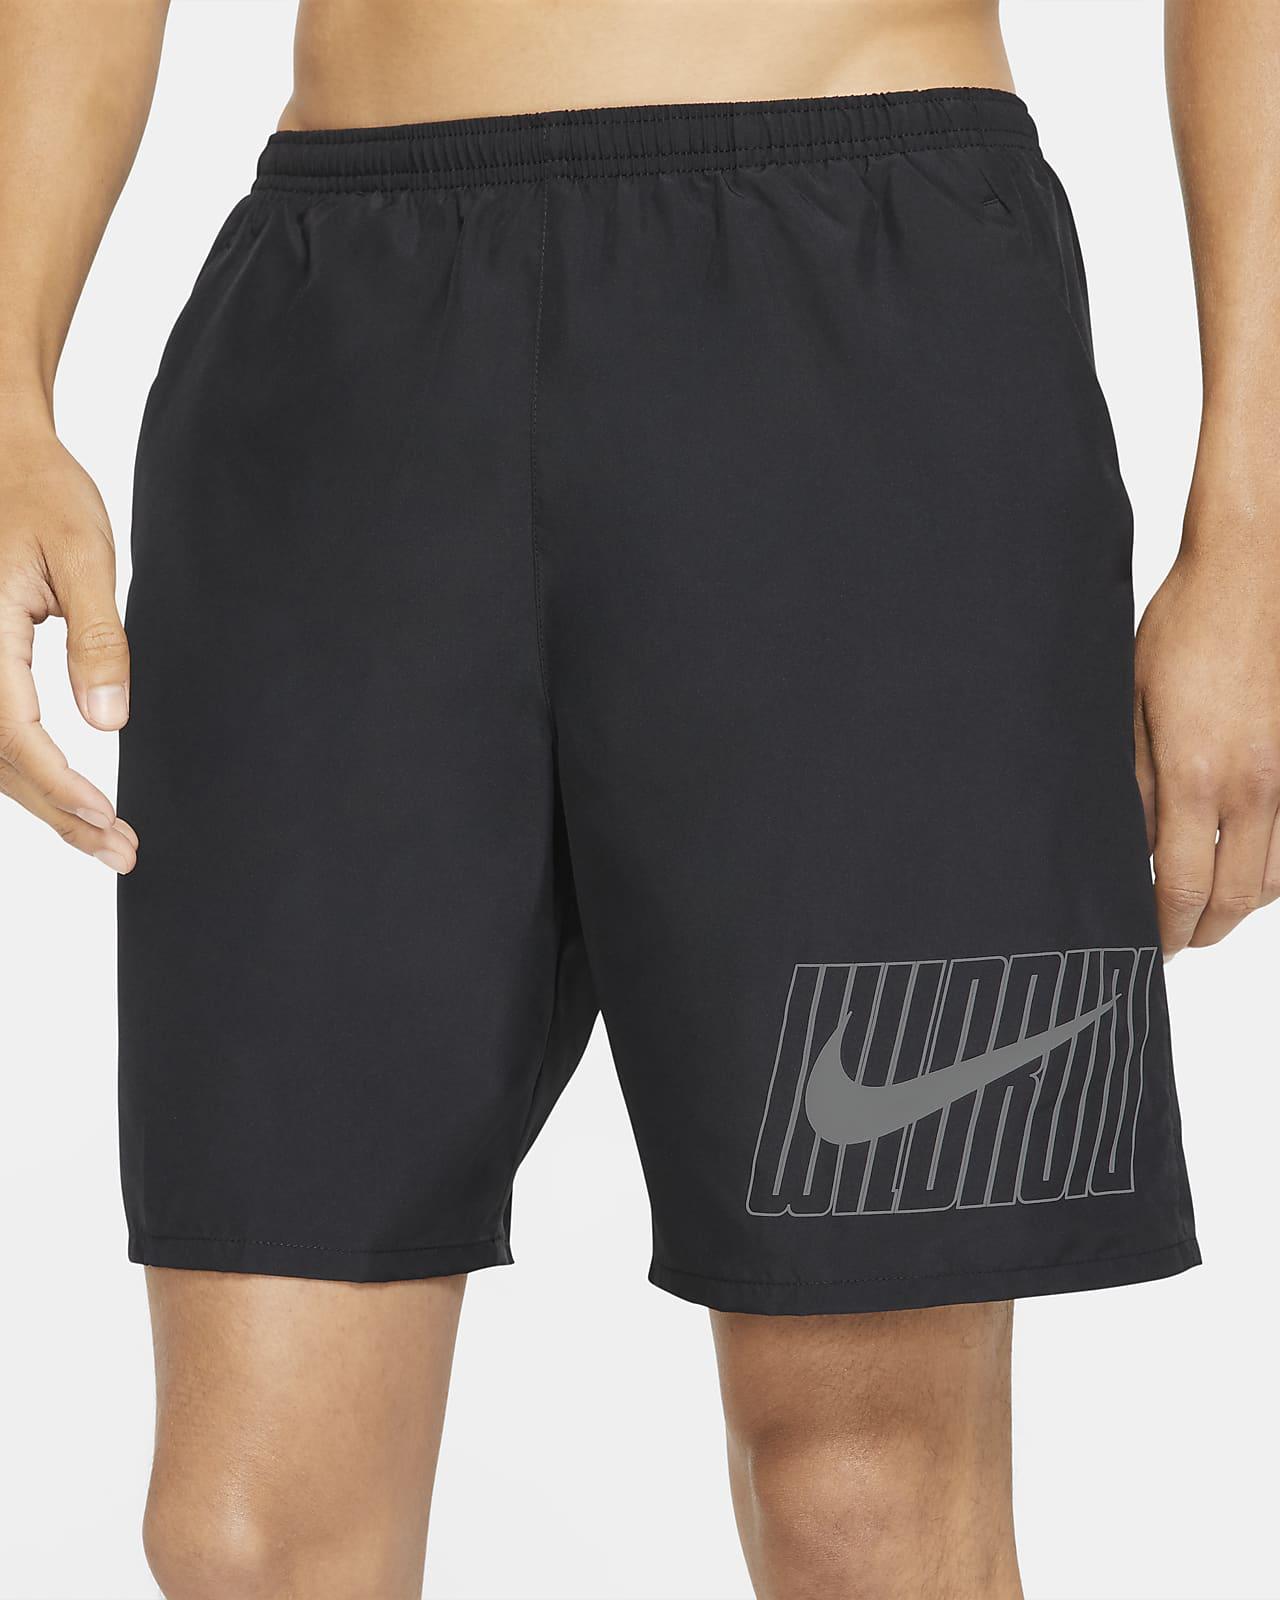 Nike Dri-FIT Run Wild Run Men's Graphic